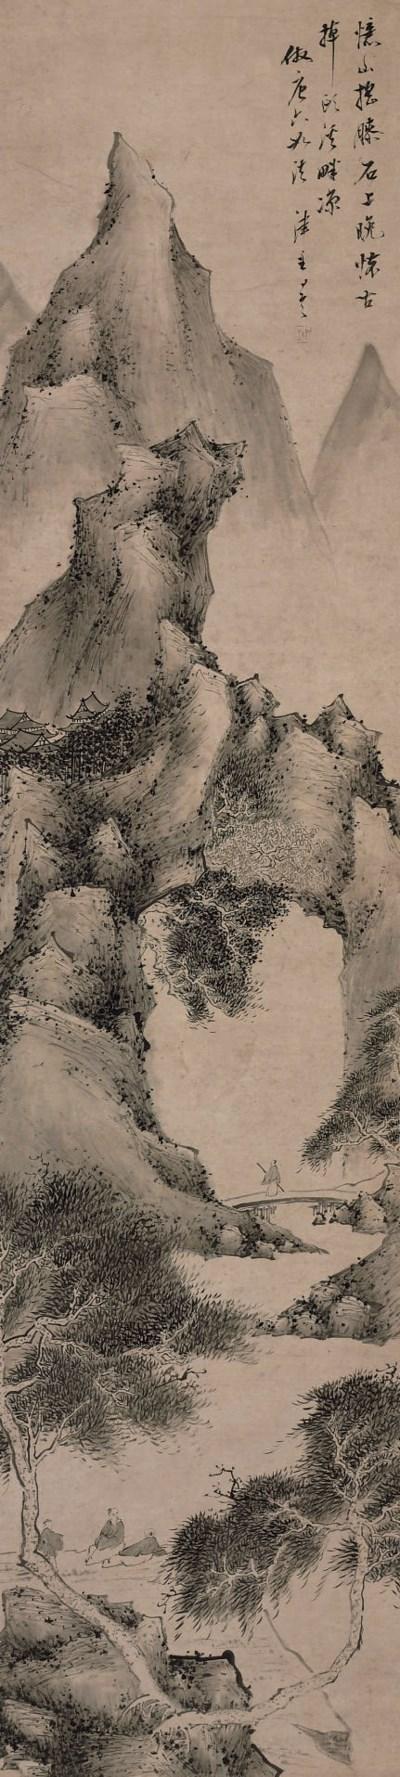 ZHU ANGZHI (19TH CENTURY)